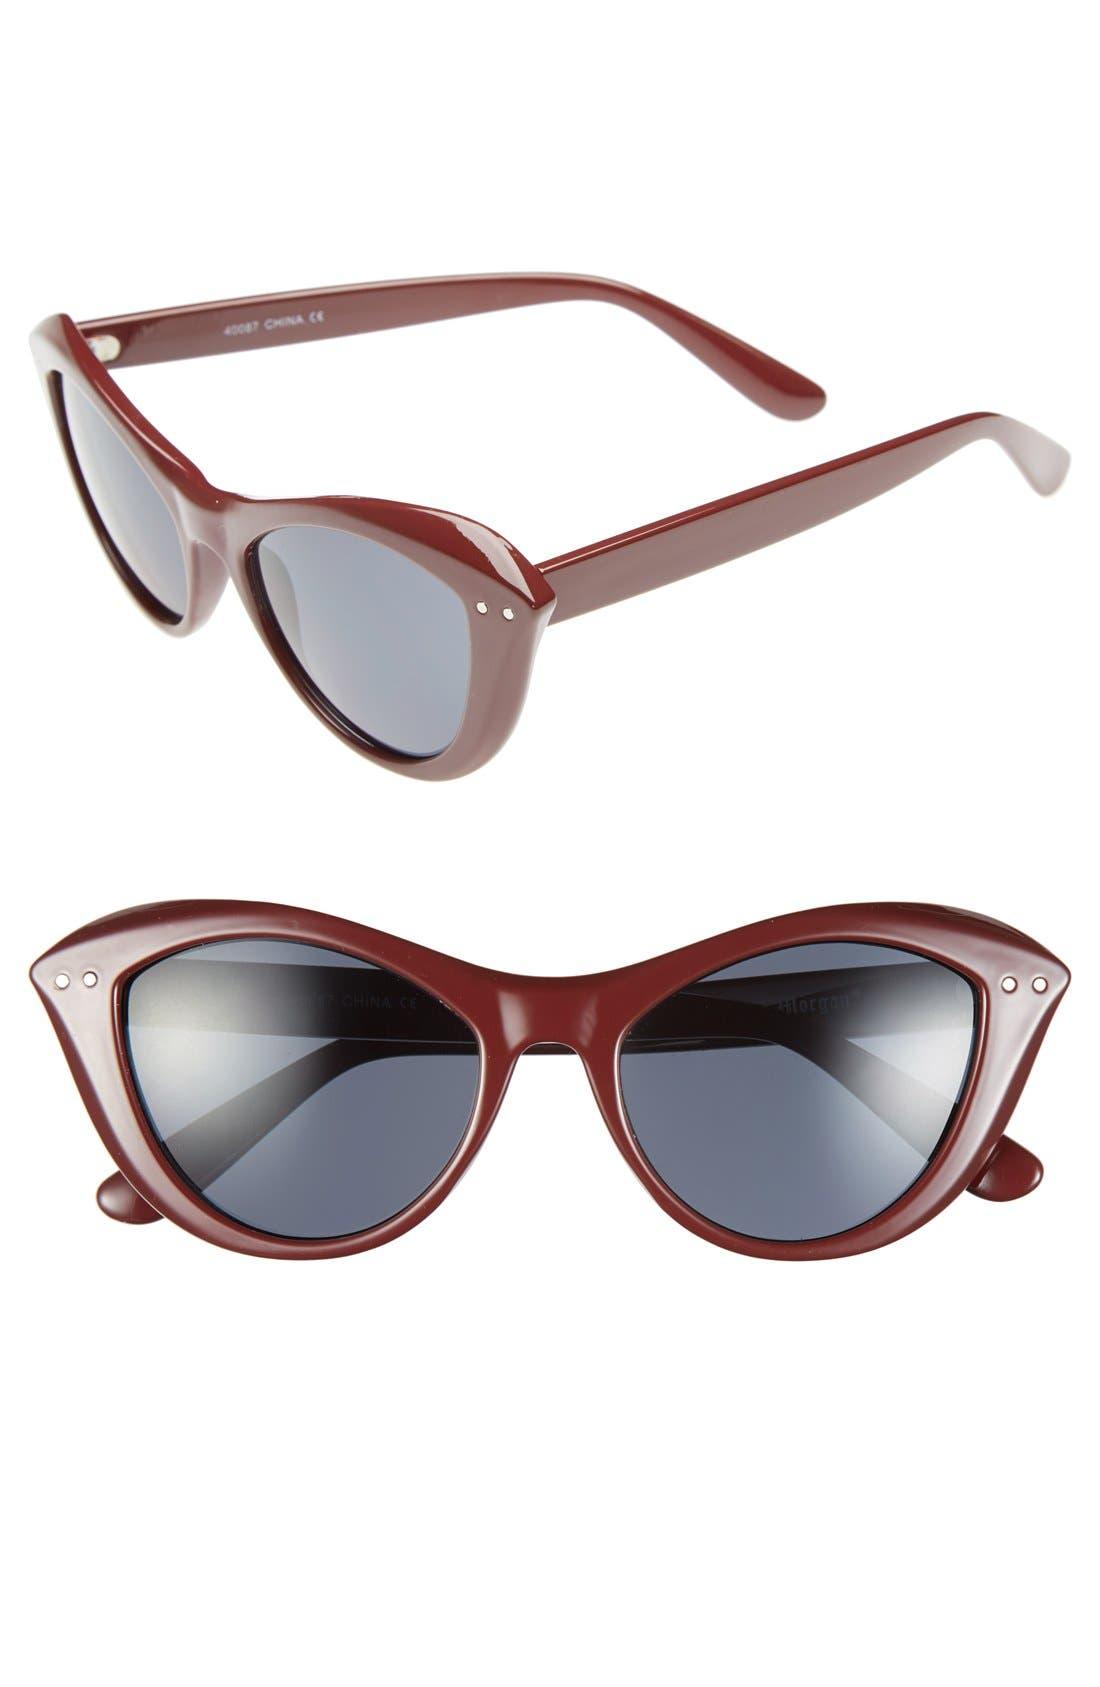 Alternate Image 1 Selected - A.J. Morgan 'Siren' 50mm Cat Eye Sunglasses